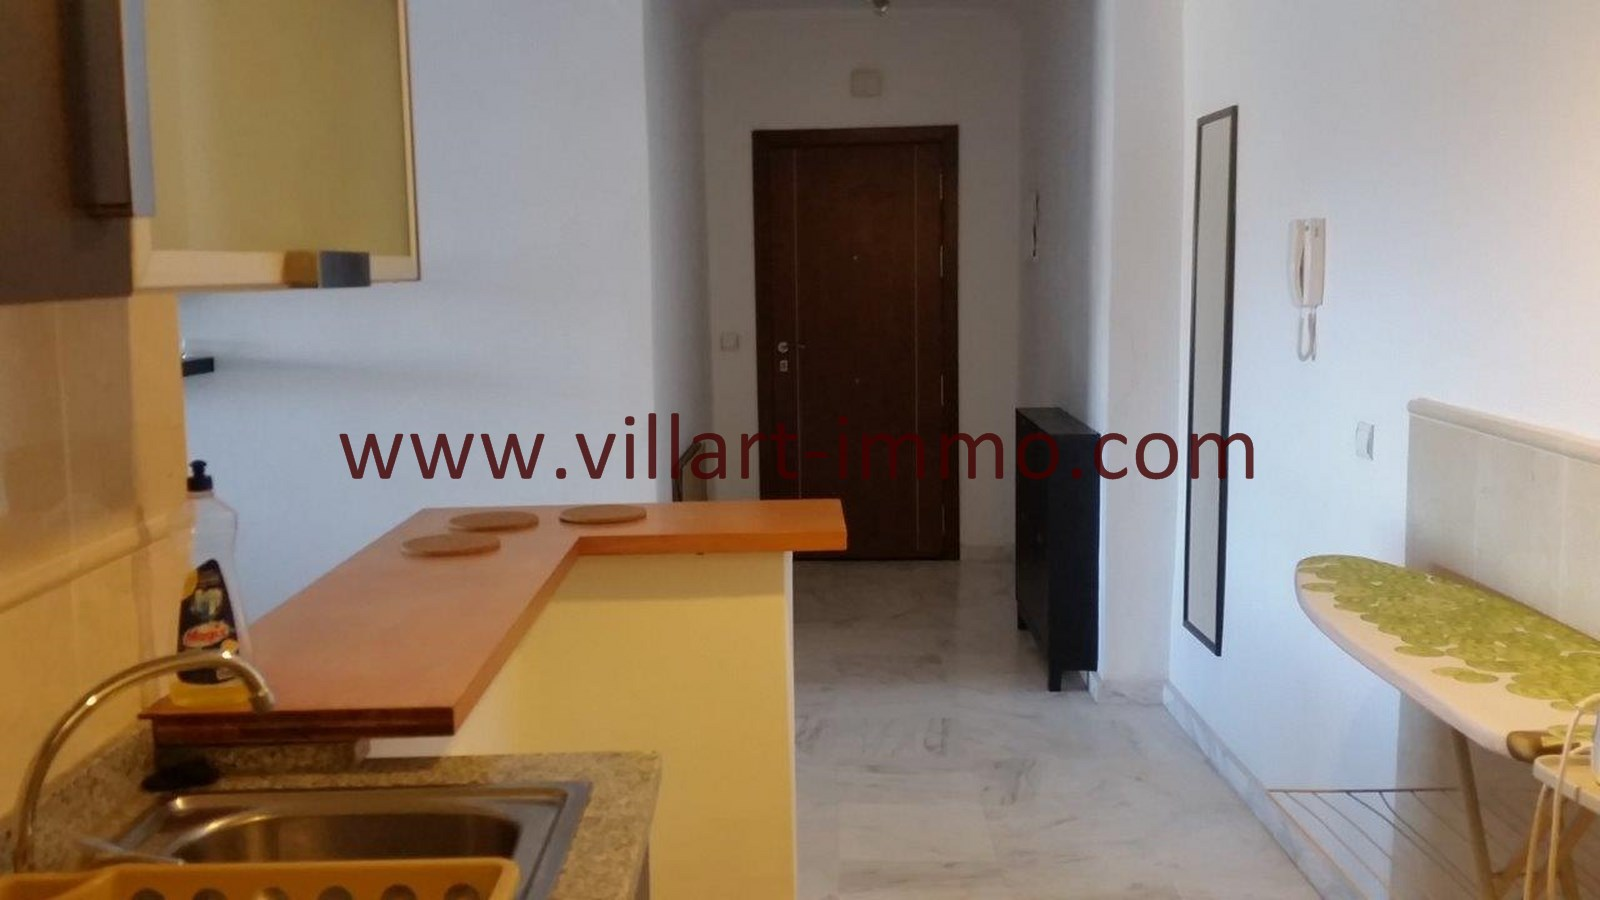 5-Vente-Appartement-Tanger-Centre-De-Ville-Cuisine 1-VA576-Villart Immo (2)